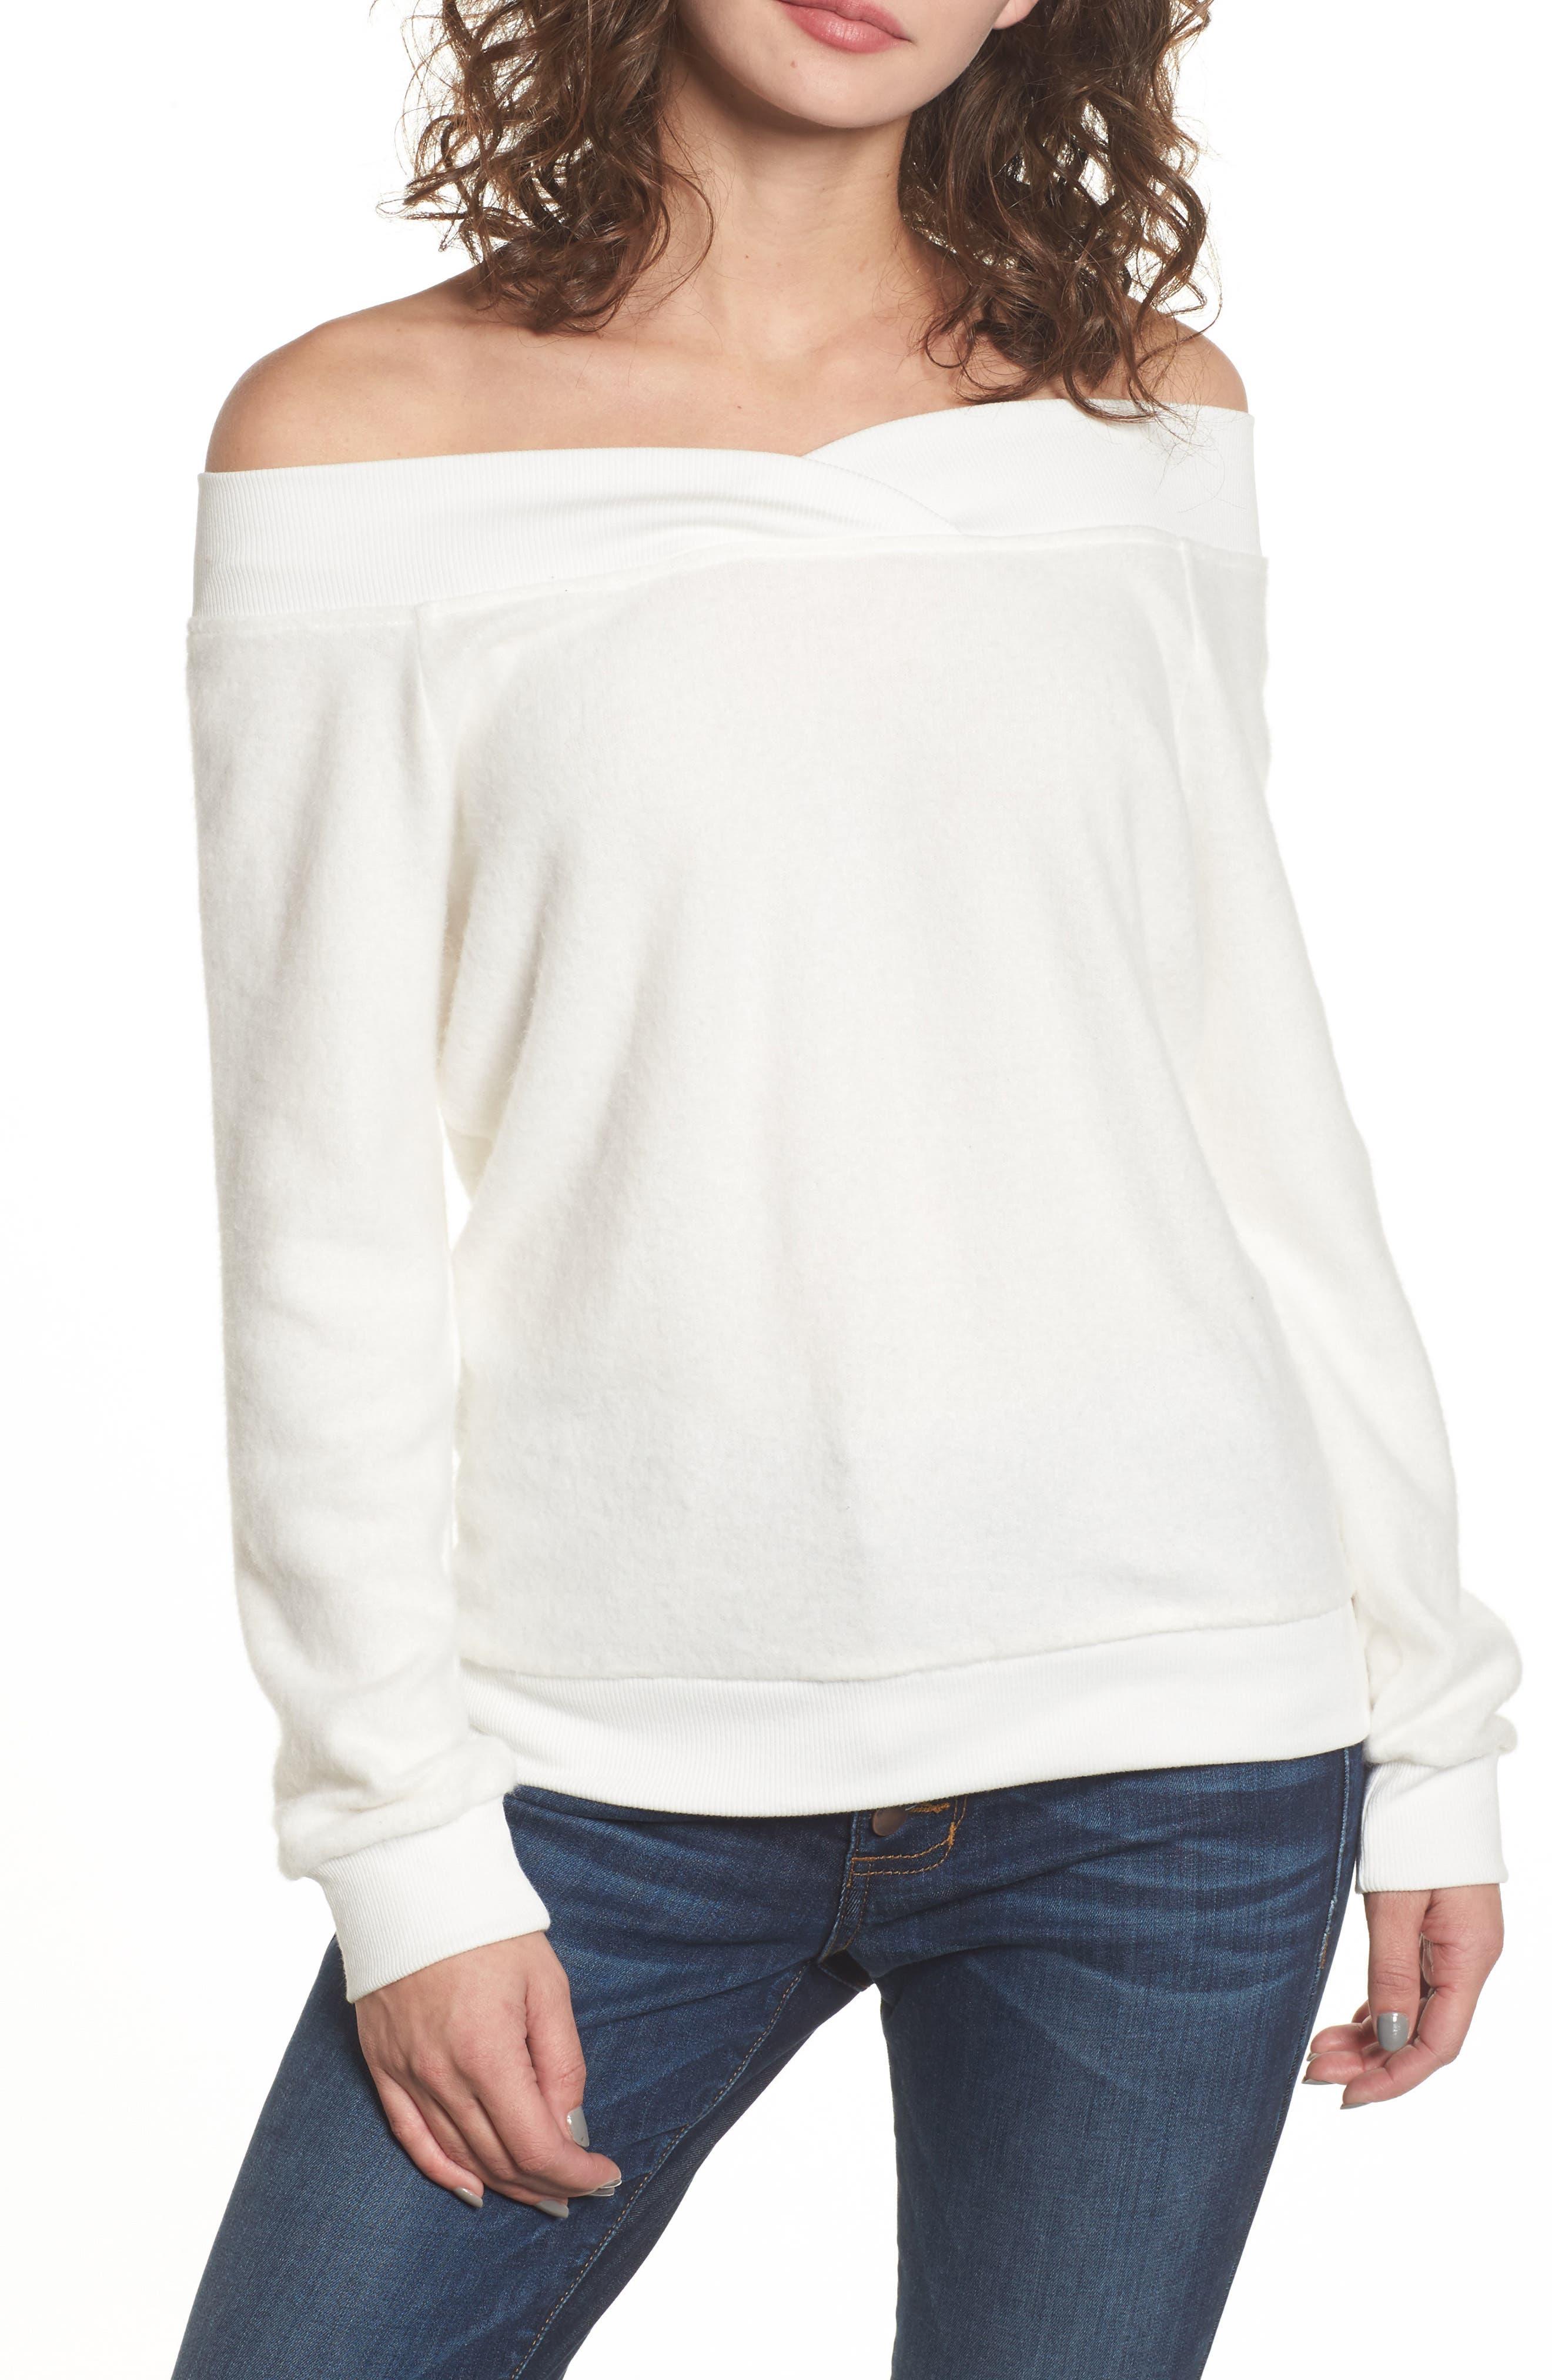 Main Image - Socialite Off the Shoulder Fleece Top